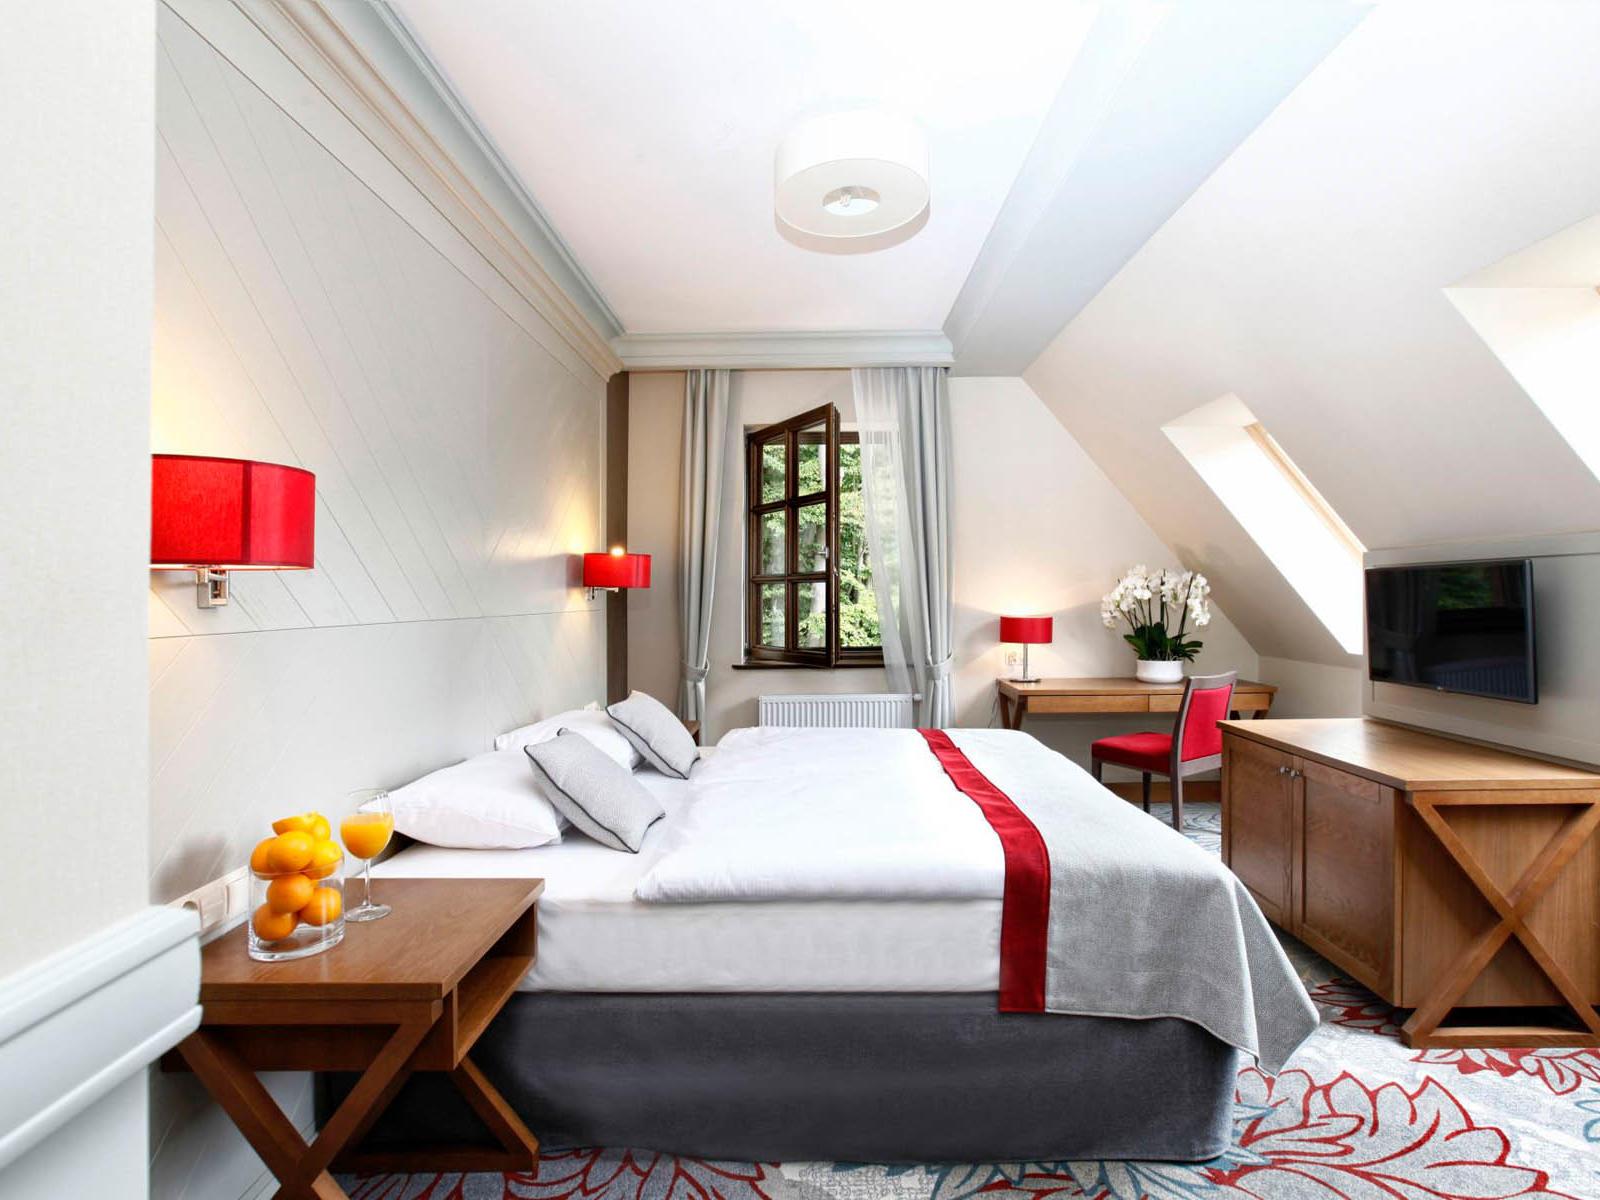 Premium Hotel Bed Hotel Aubrecht Country Spa